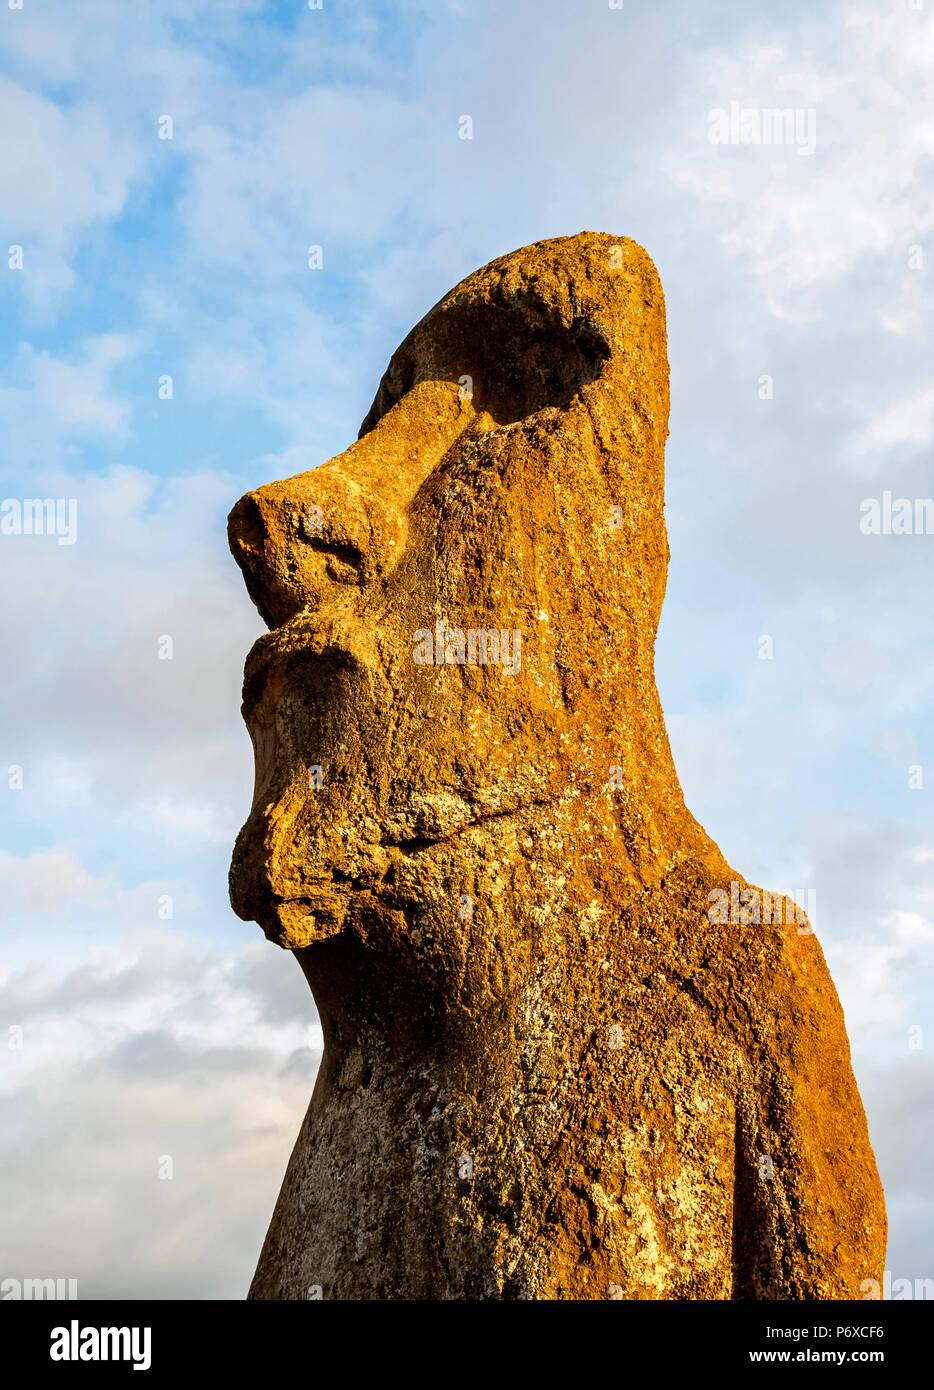 Moai di Ahu Tongariki, Parco Nazionale di Rapa Nui, Isola di Pasqua, Cile Immagini Stock